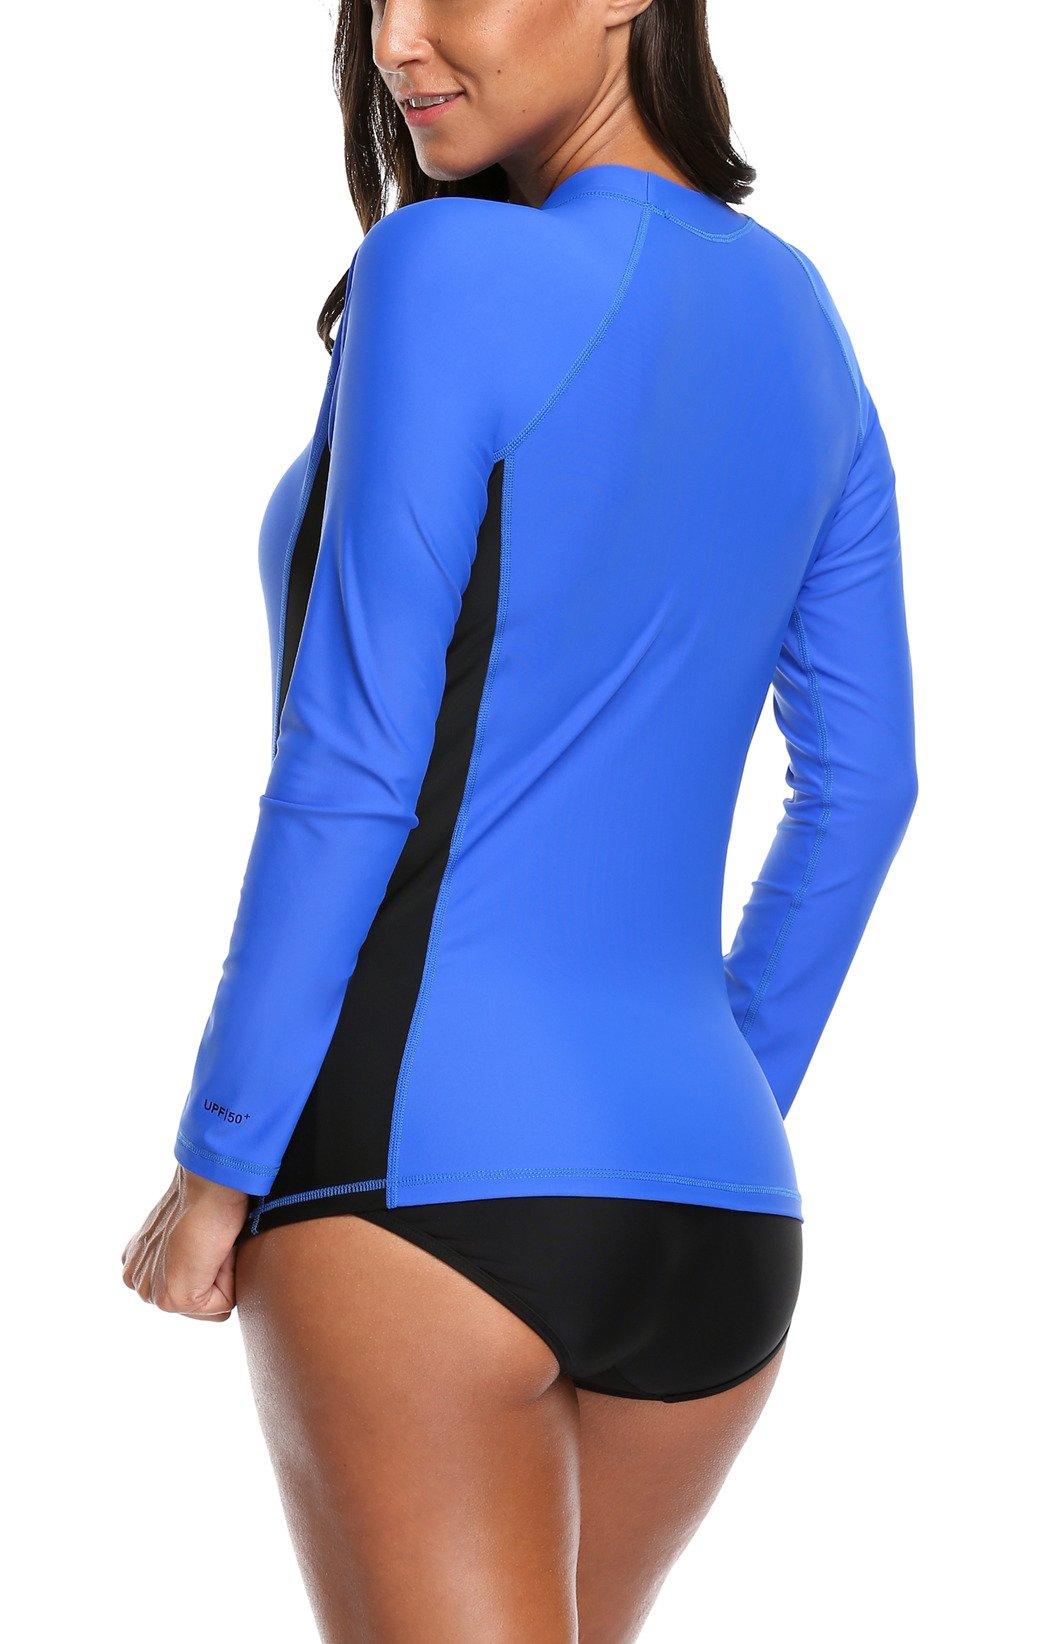 ALove Surf Shirt Rash Guard UPF 50 Athletic Top Womens Surf Rashguard Long Sleeve Medium by ALove (Image #4)